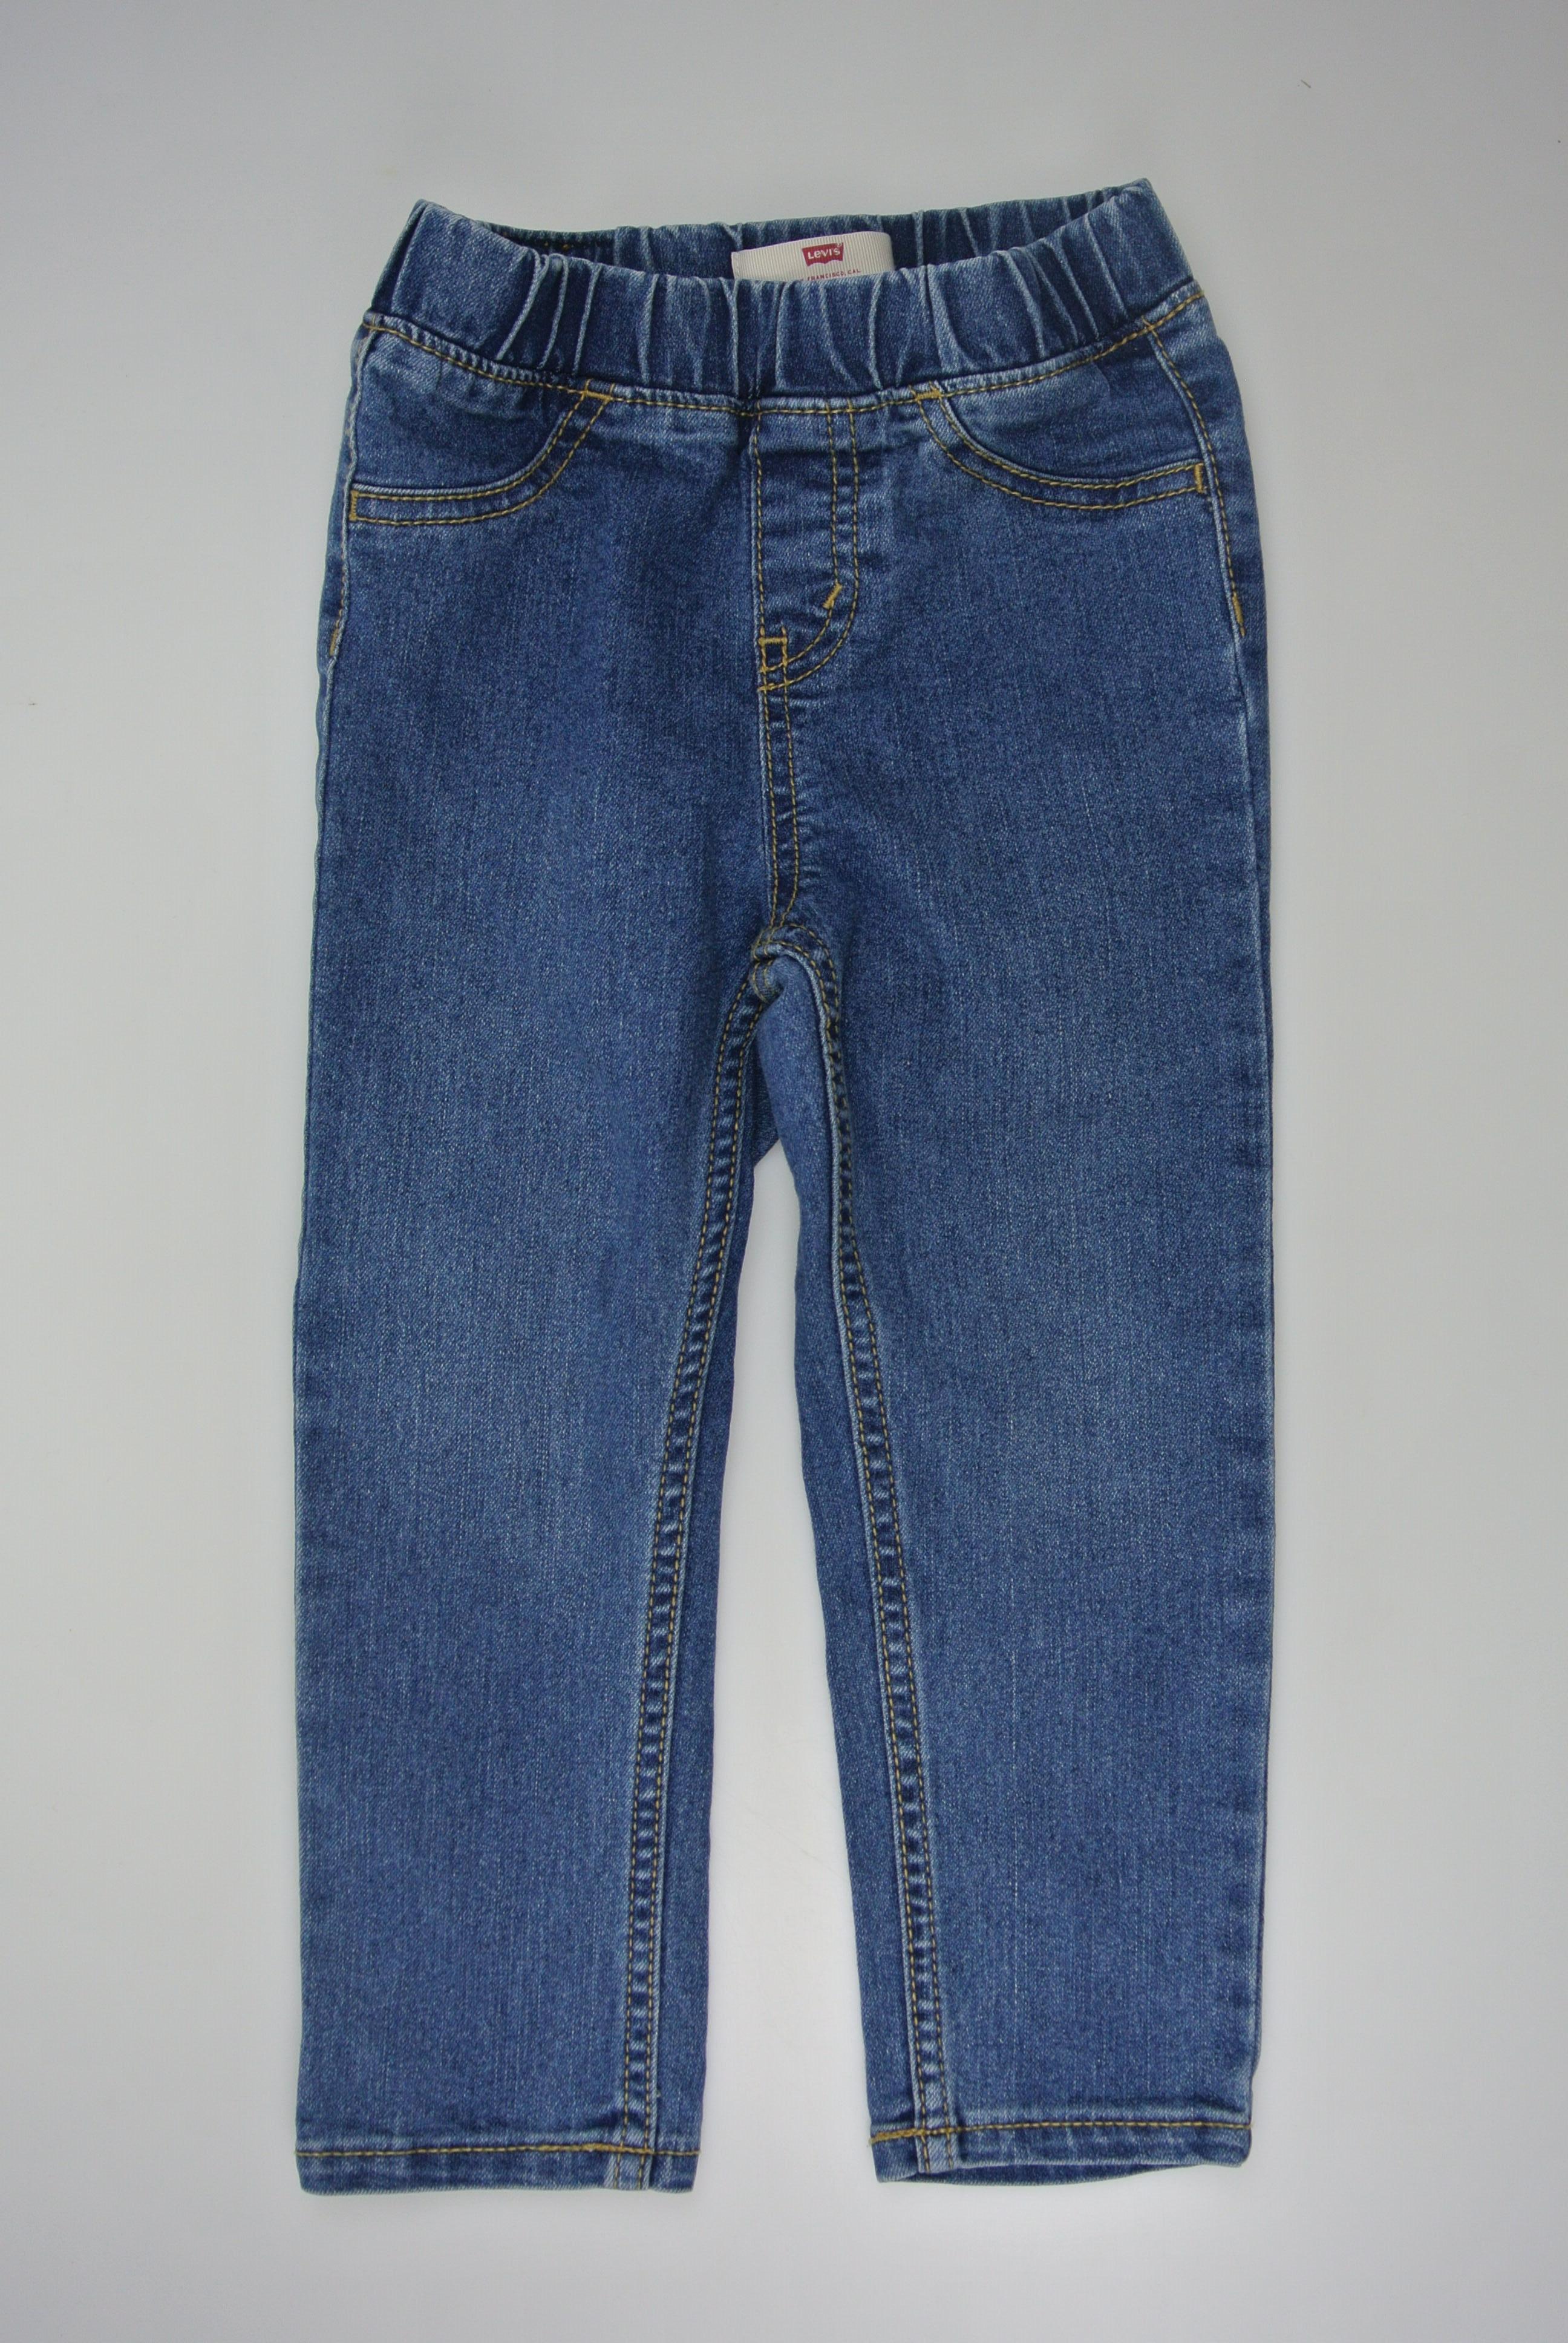 Levis bukser str 98 dreng